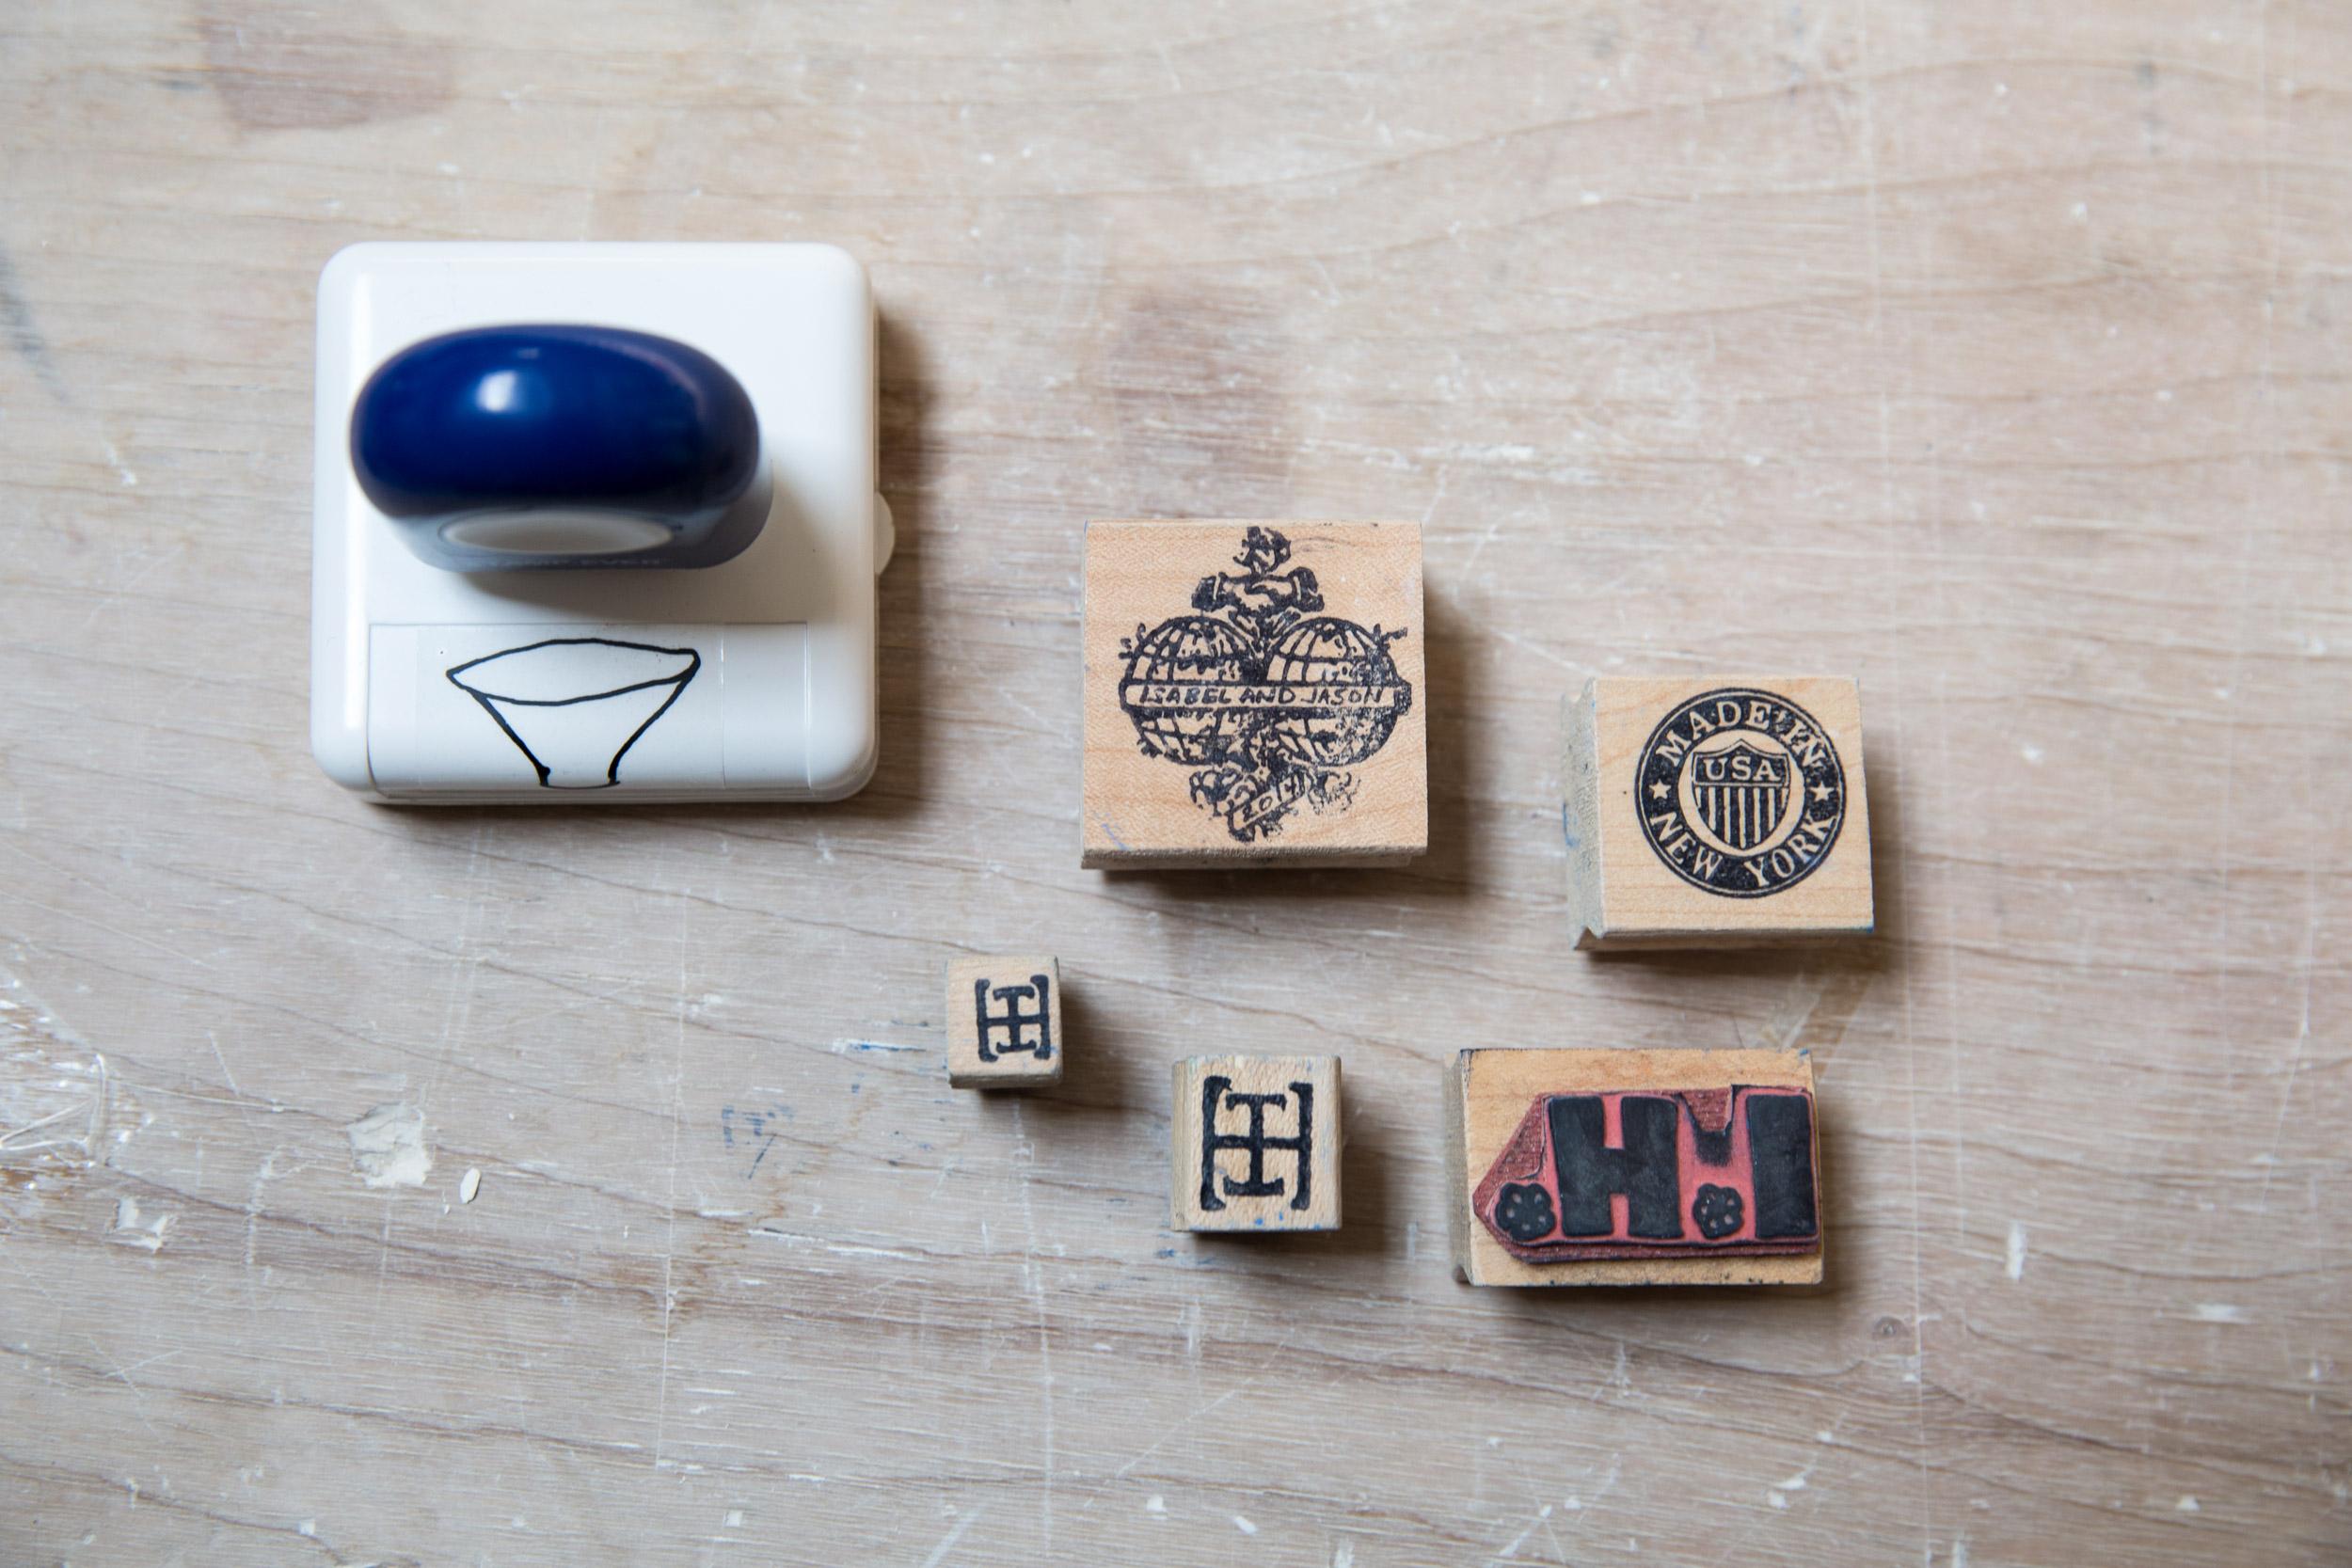 Isabel Halley Ceramics - Featured in Design Sponge